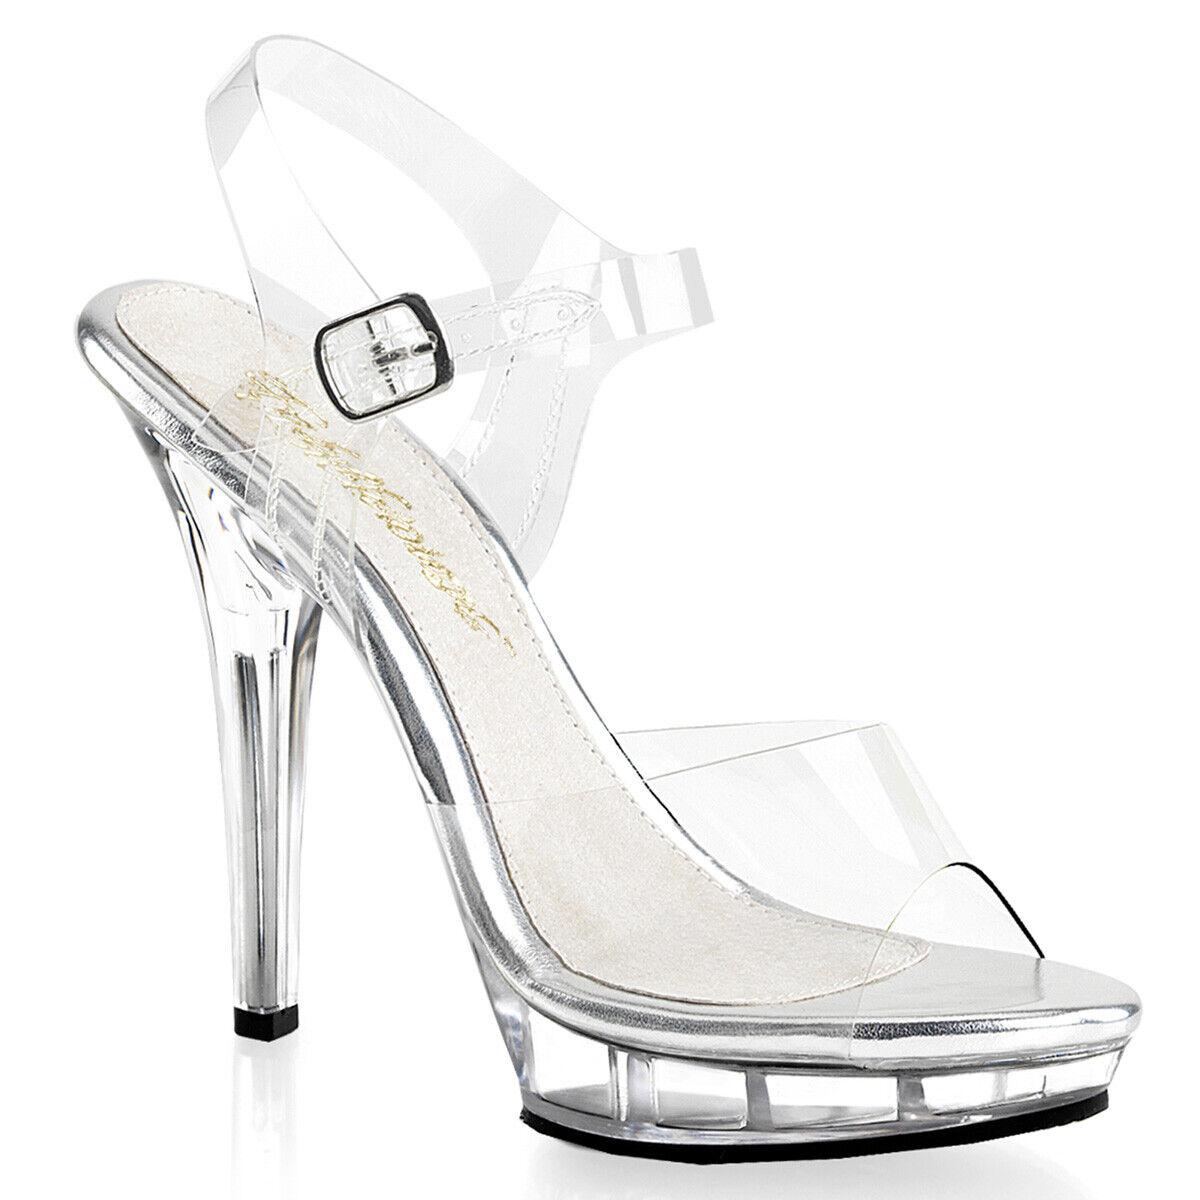 "PLEASER LIP108/C/M Sexy 5"" Heels Stilettos Stripper Mini Platform Clear Shoes"